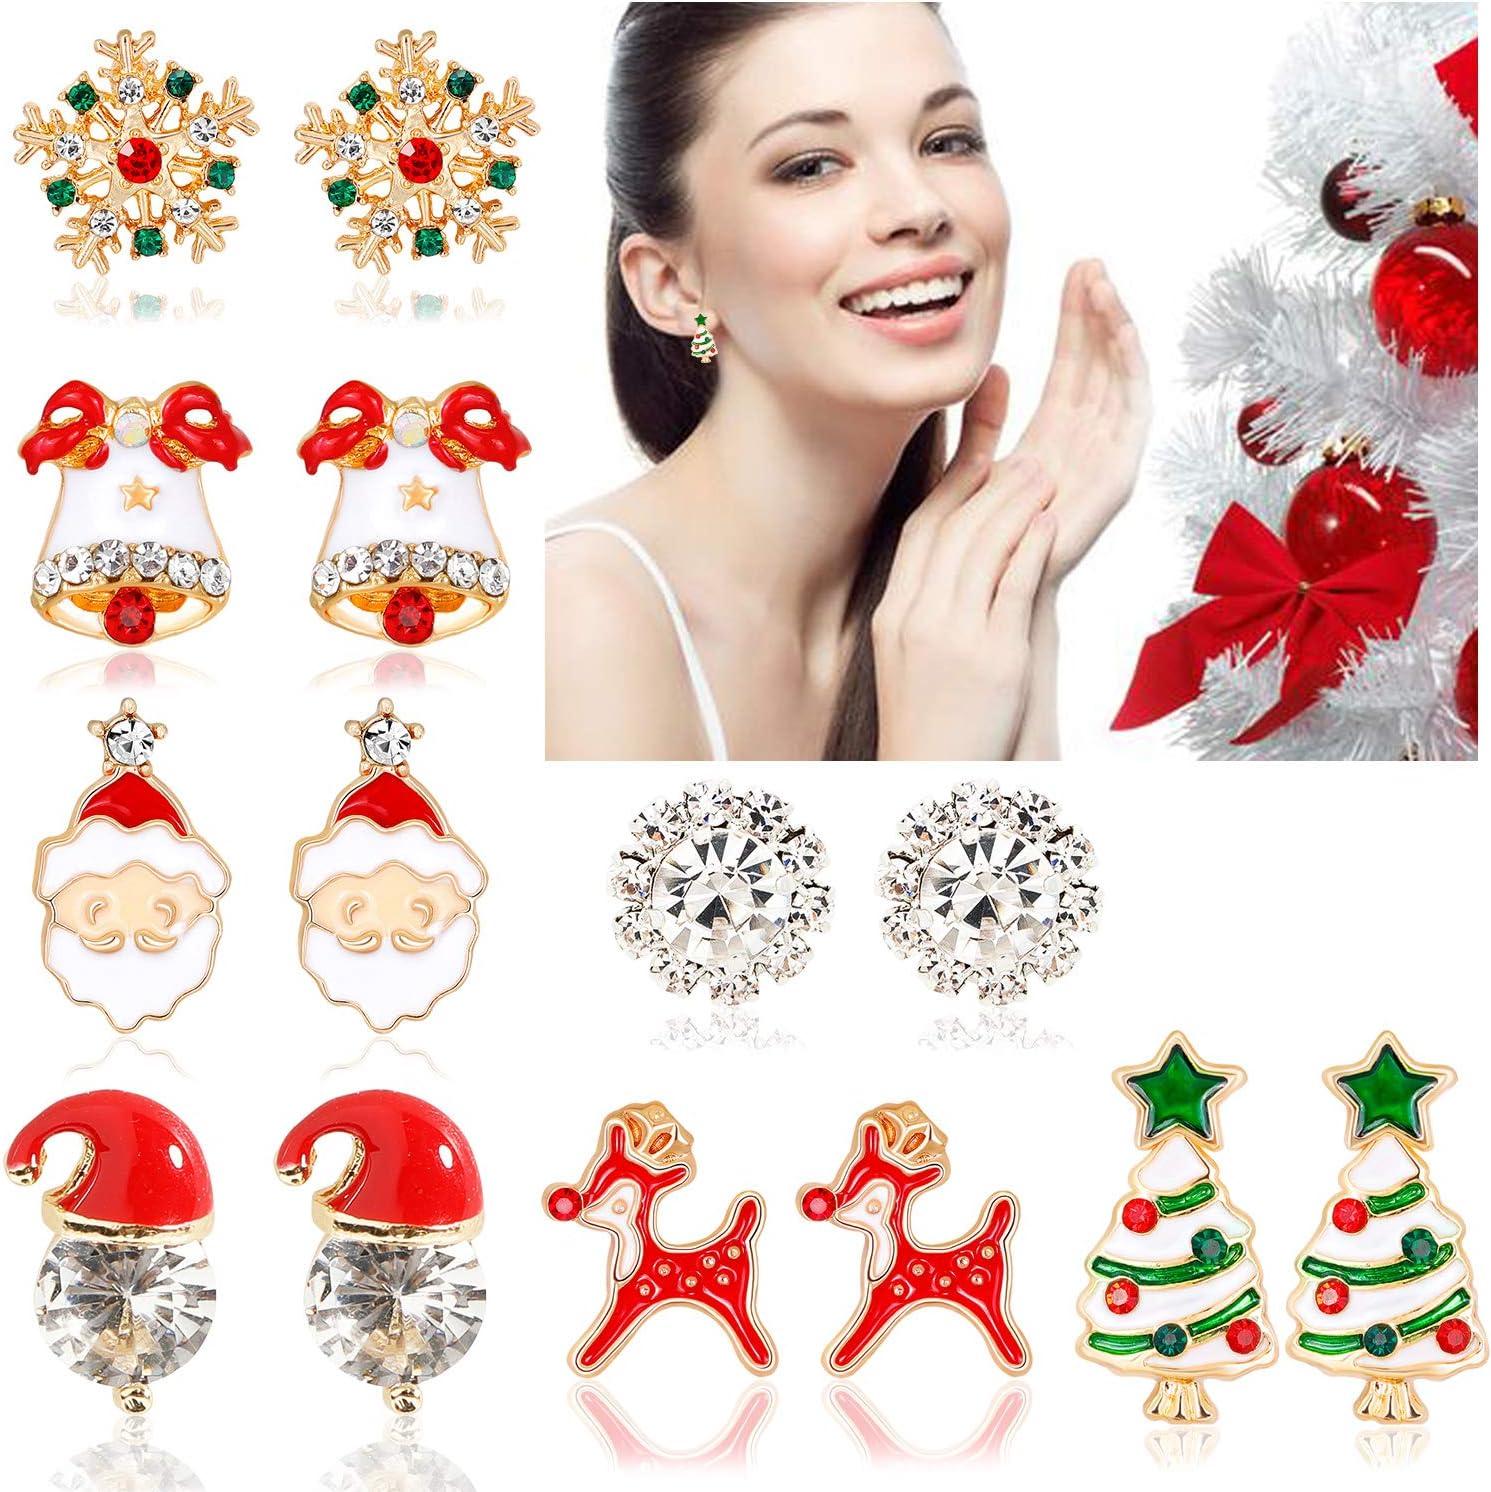 Konsait 7 Pairs Christmas Earrings Studs for Women, Xmas Earrings for Girls Christmas Tree Santa Hat Reindeer Snowflake Jingle Bell Earrings Studs for Christmas Party Decoration